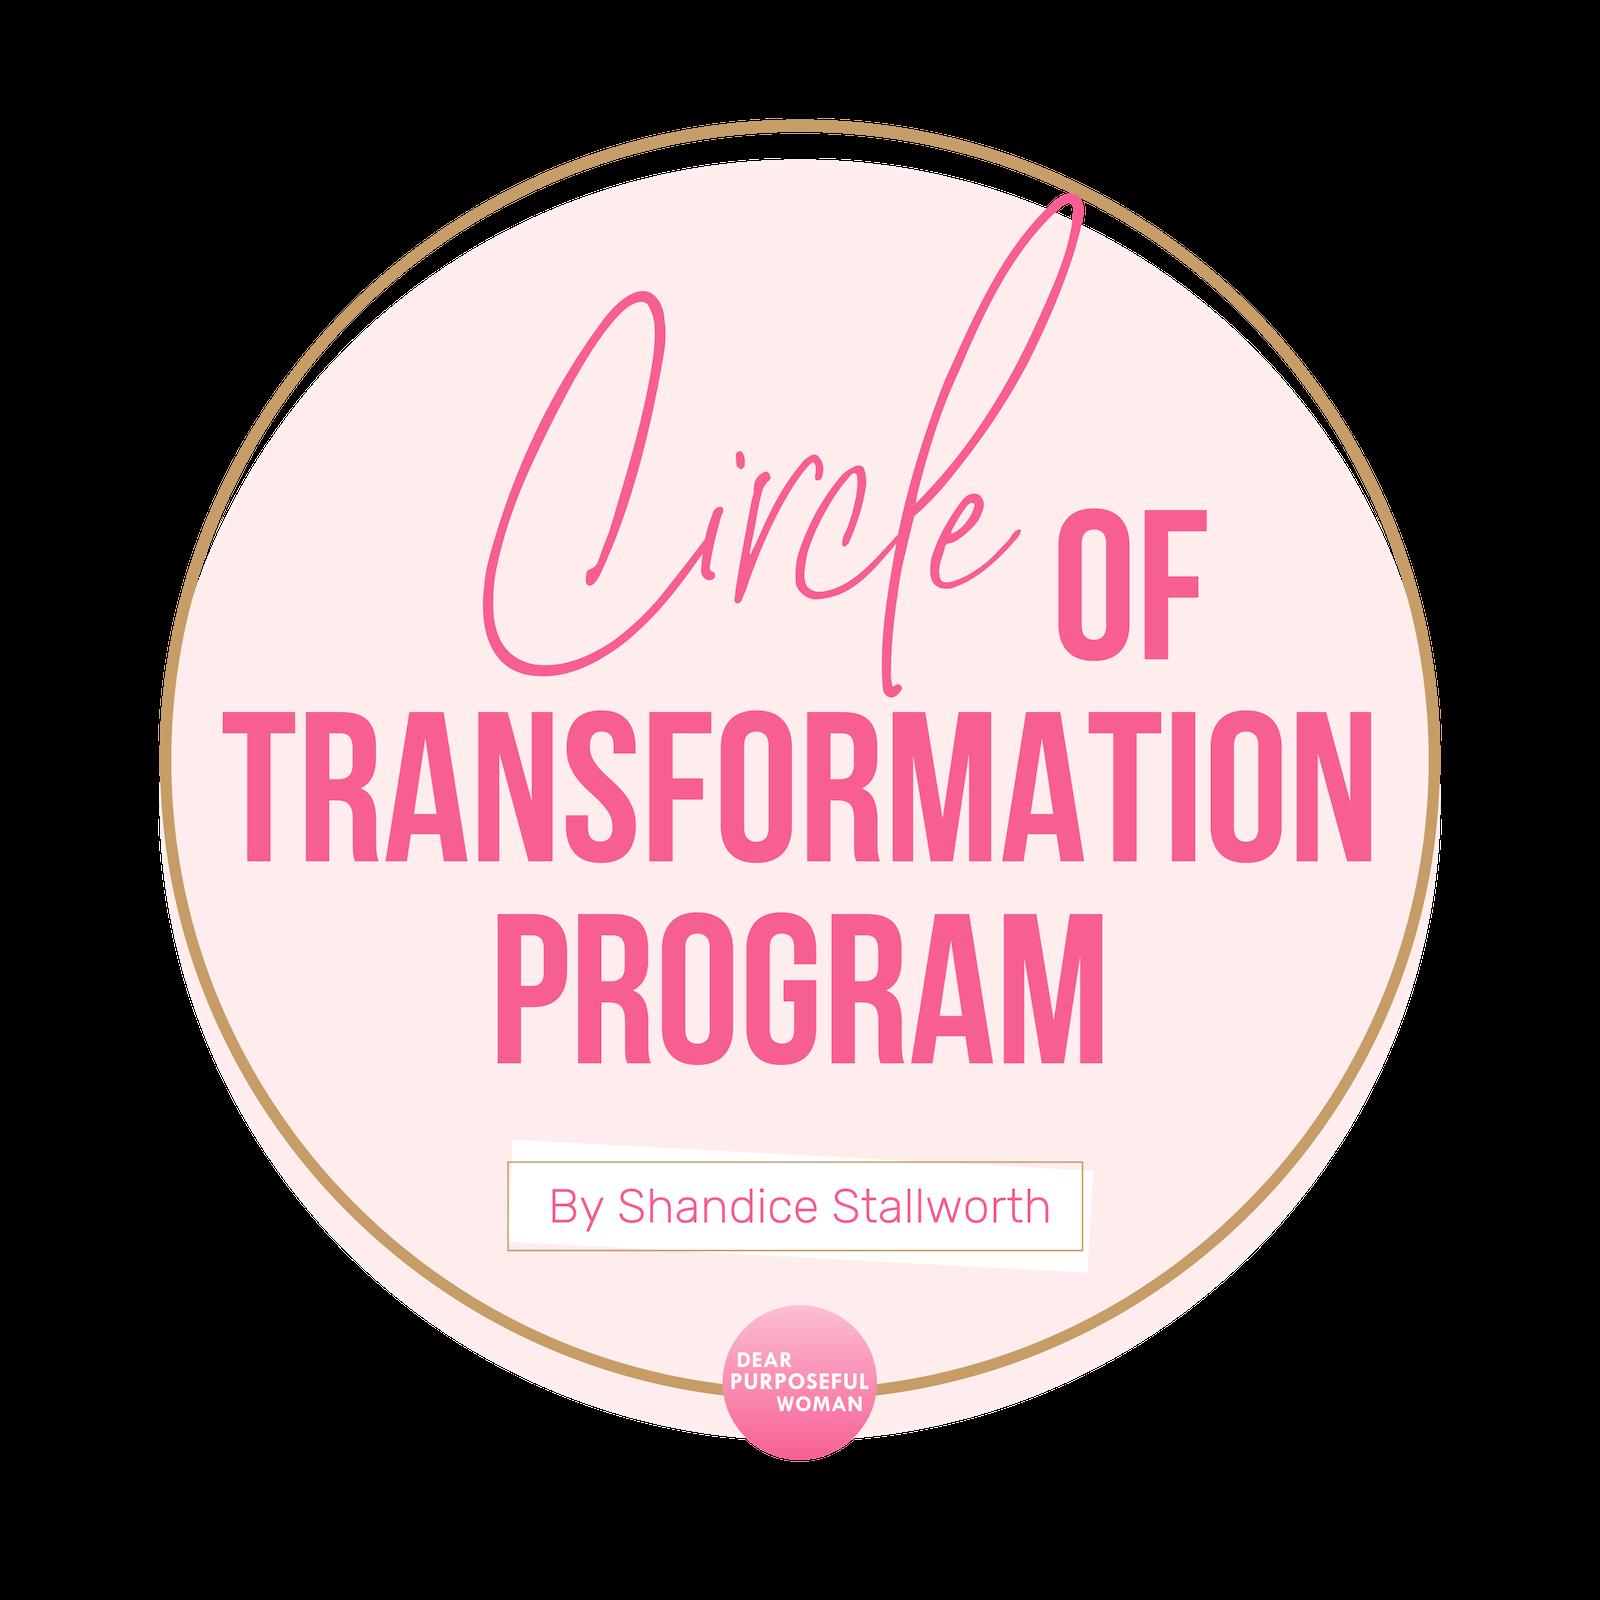 Dear purposeful Woman - Circle of Transformation Program By Shandice Stallworth.png